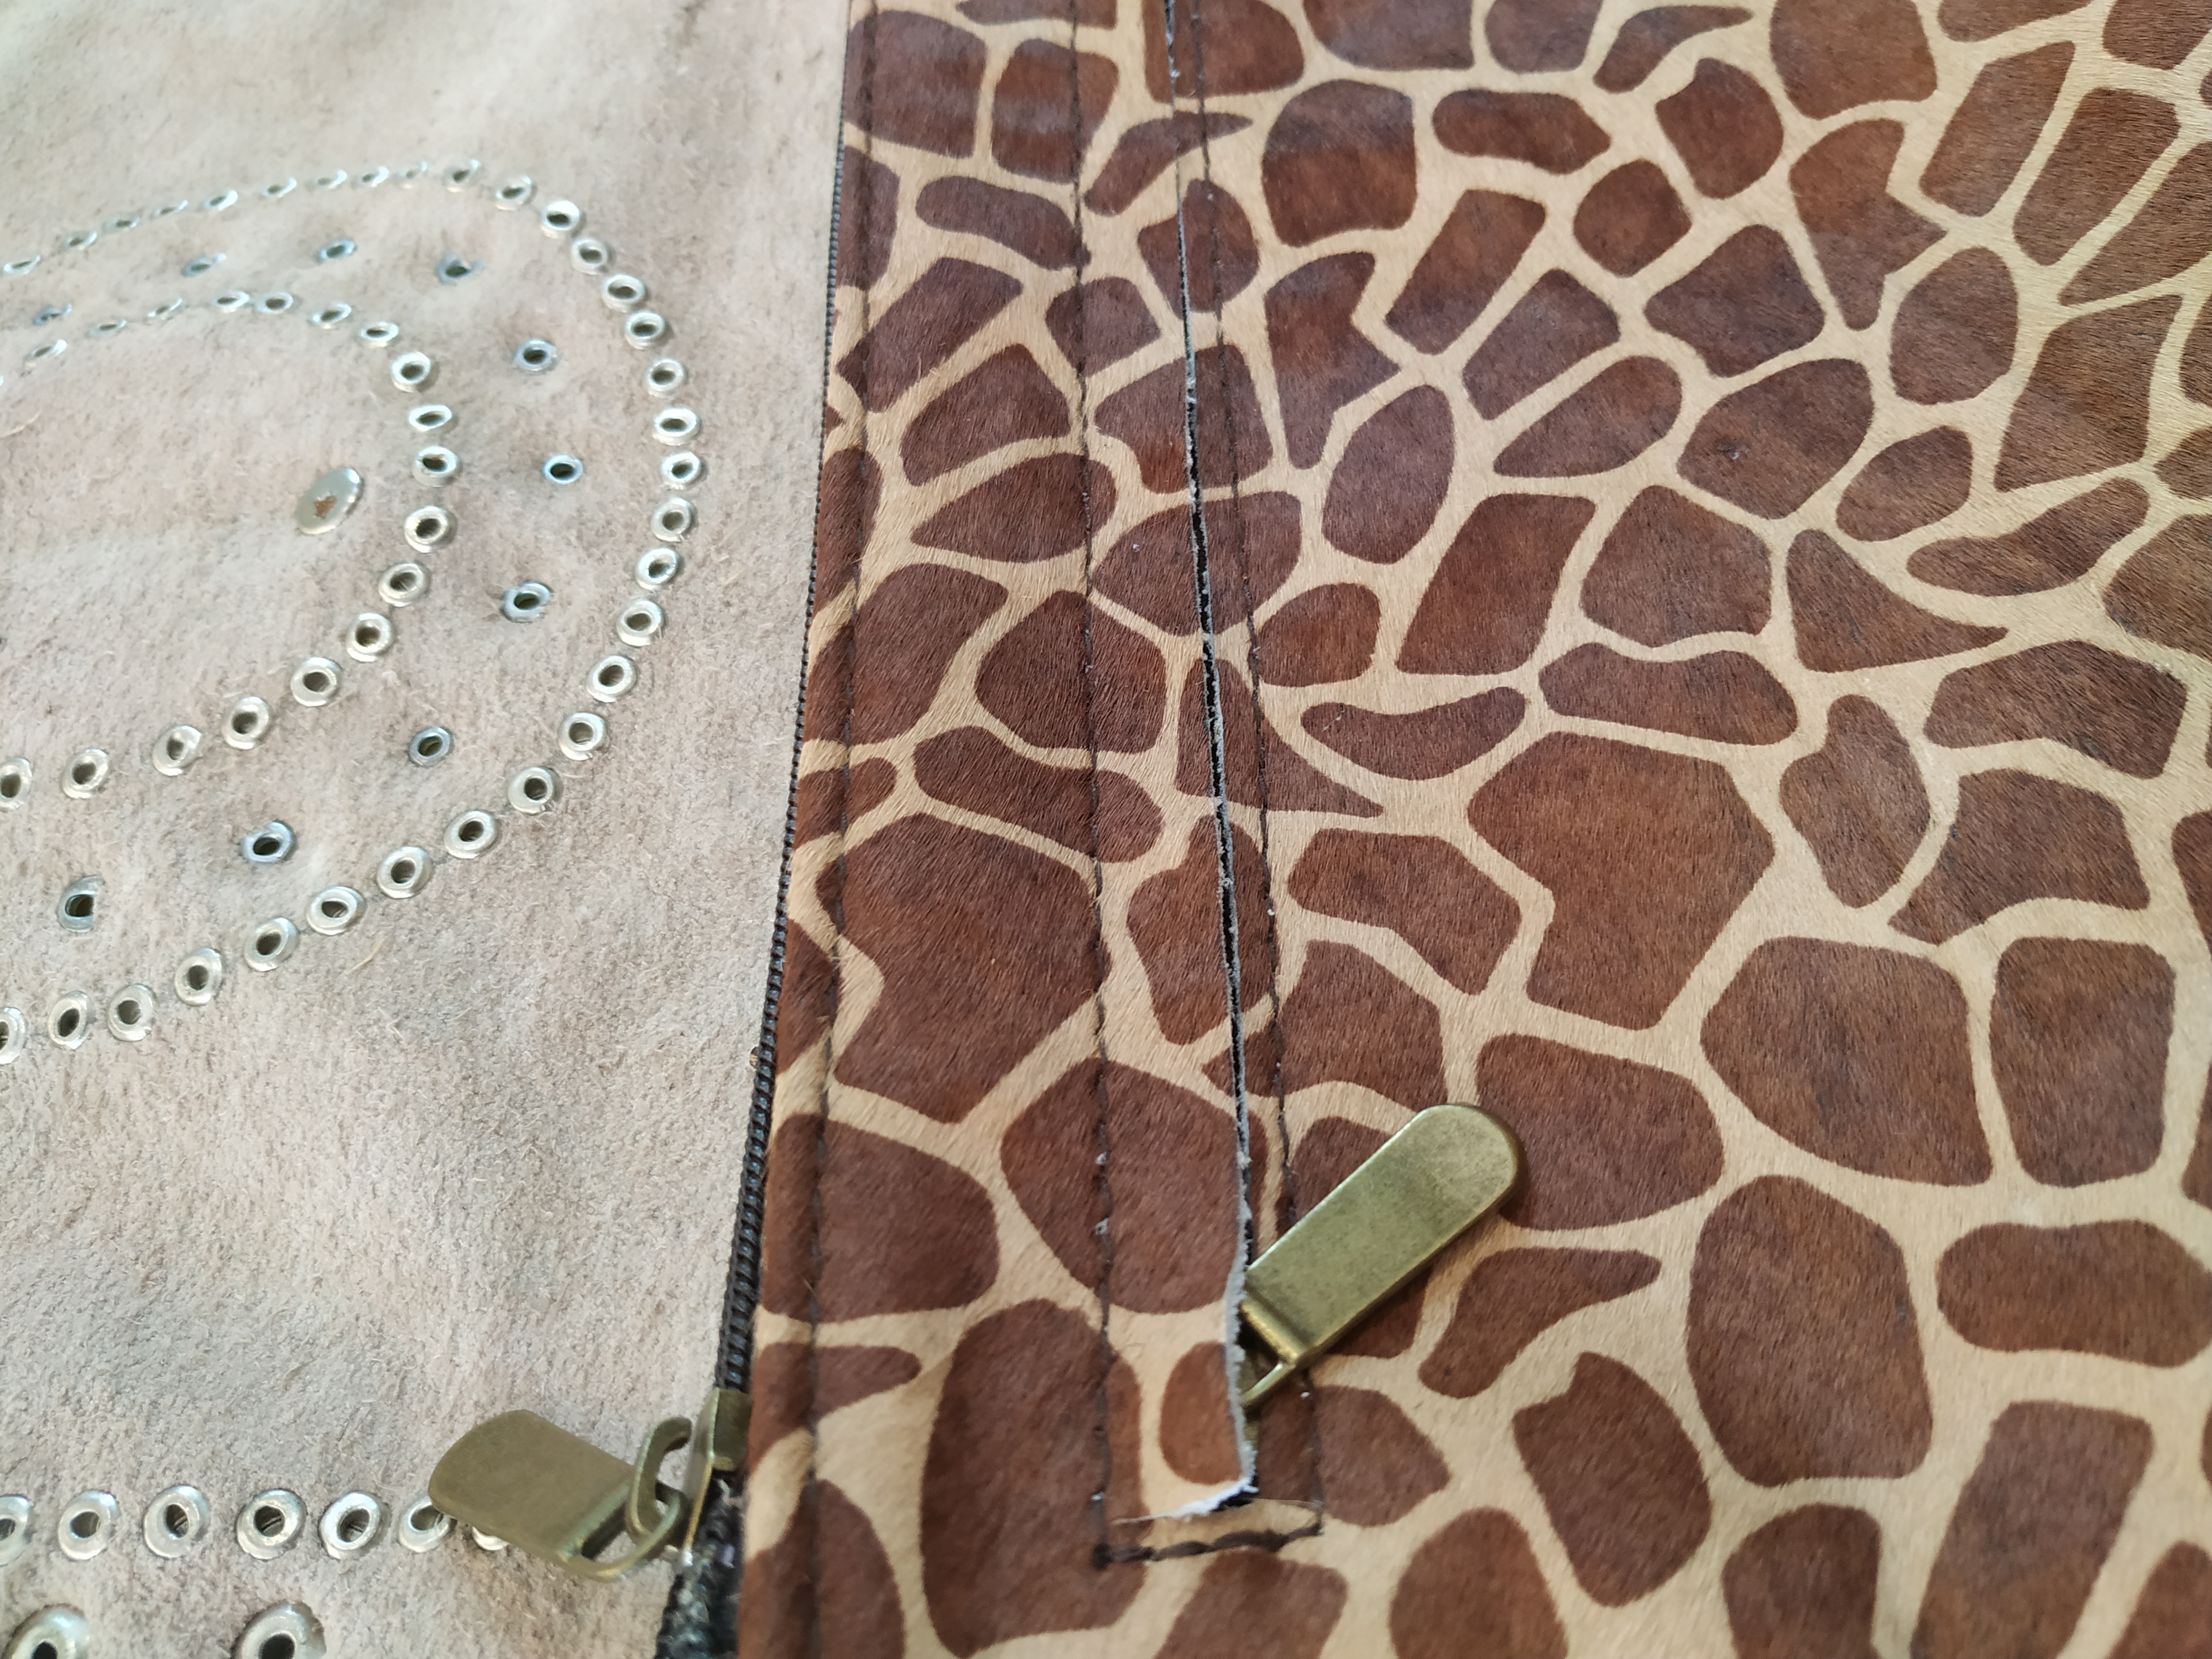 miuma-sobre-artesanal -piel-animal-tachas-moda-cambrils (2)